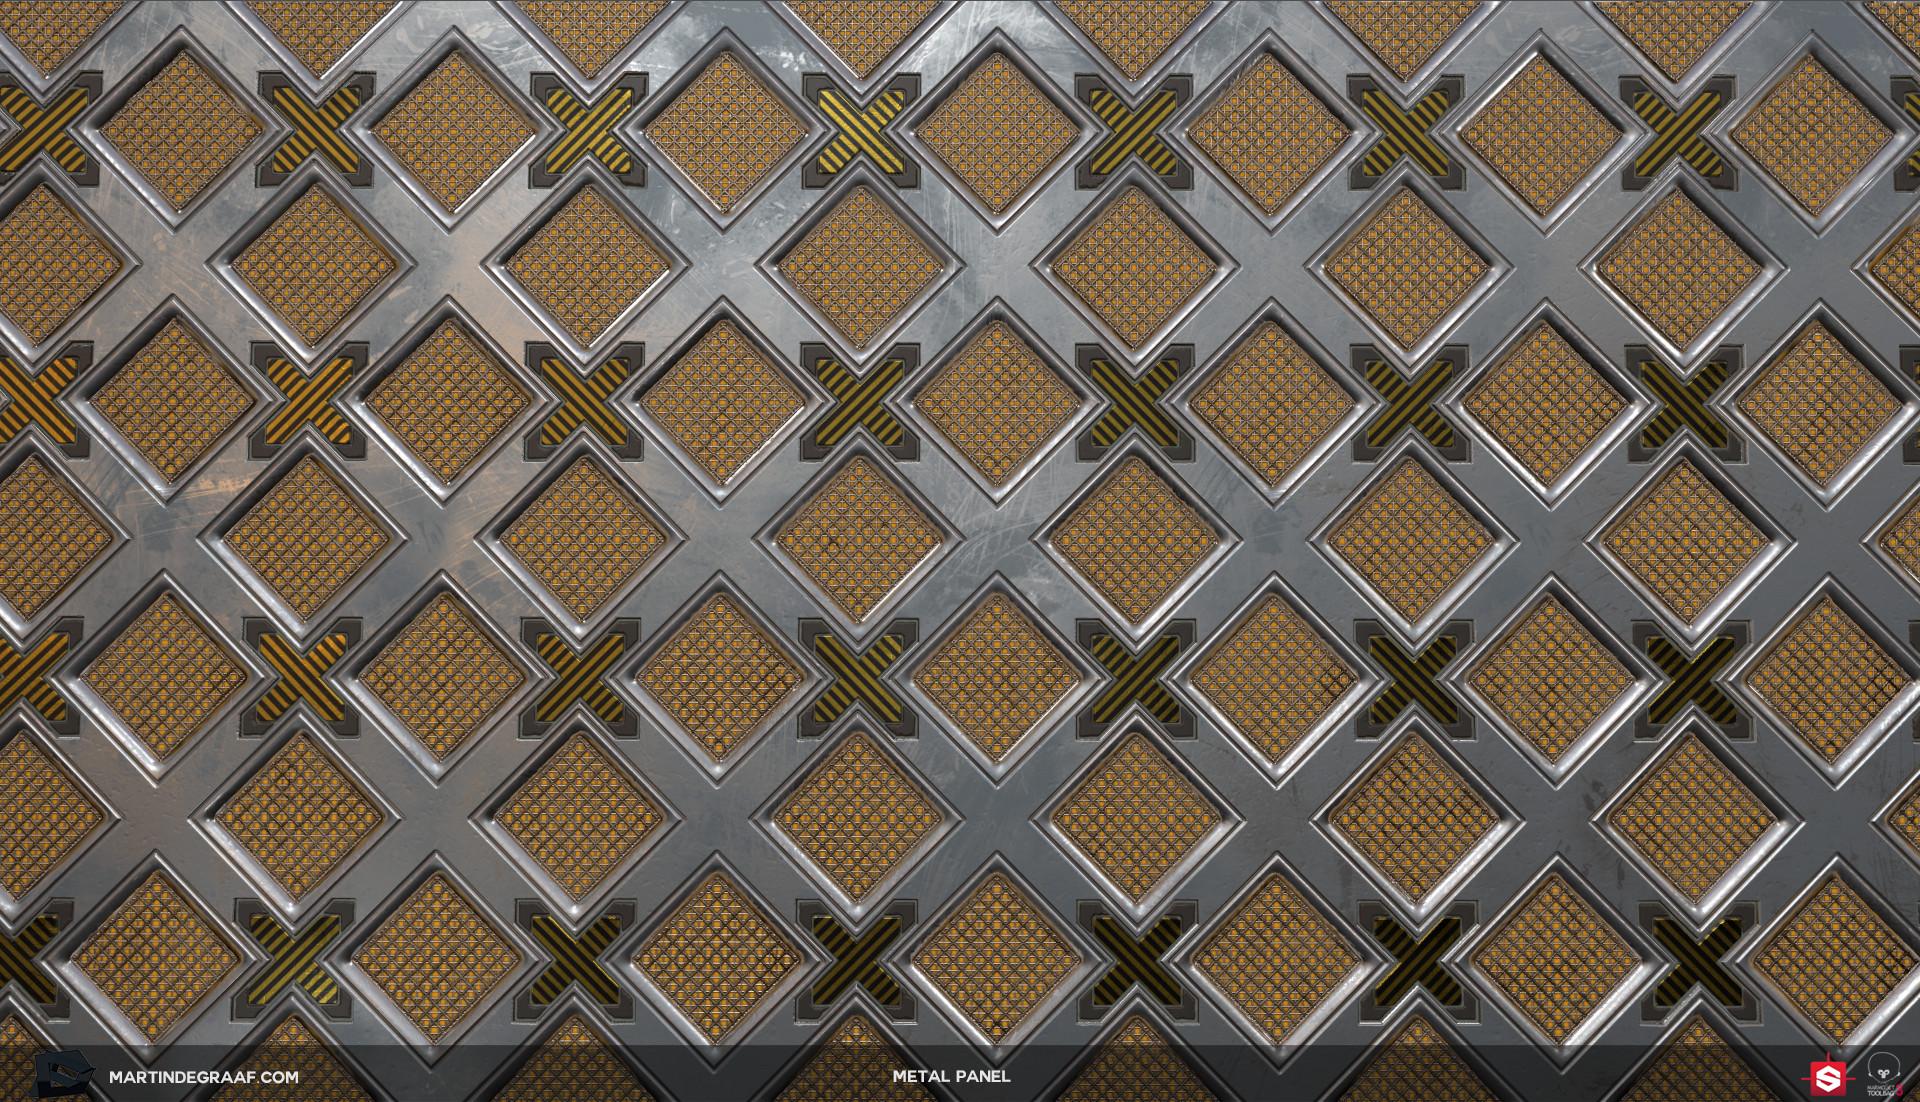 Martin de graaf metal panel substance plane2 martin de graaf 2017